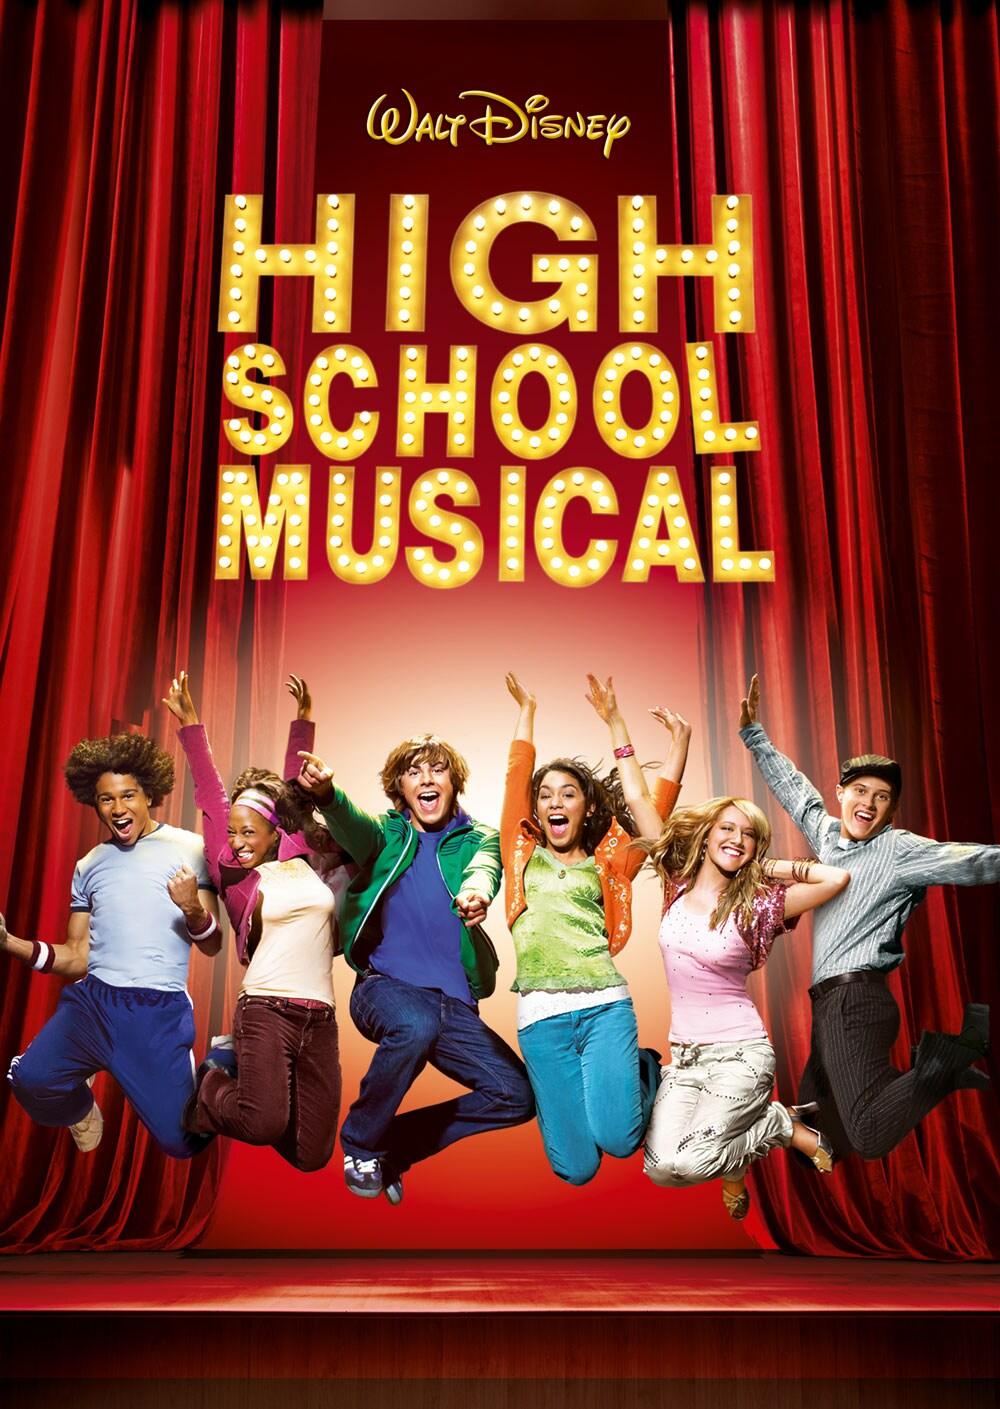 High School Musical Movie Review - Common Sense Media